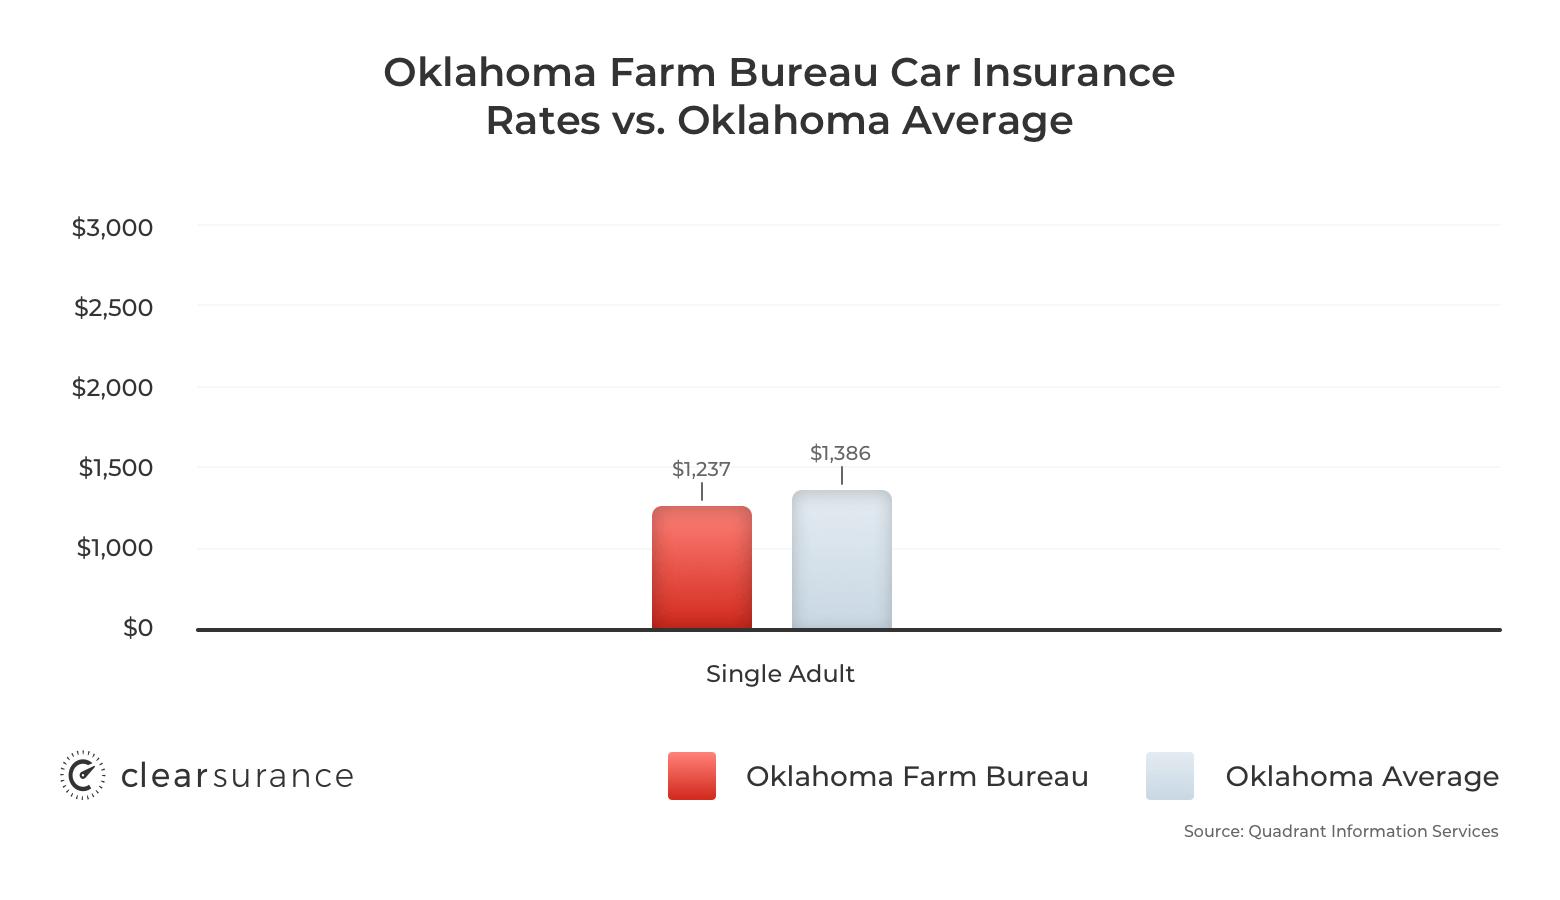 Oklahoma Farm Bureau car insurance rates